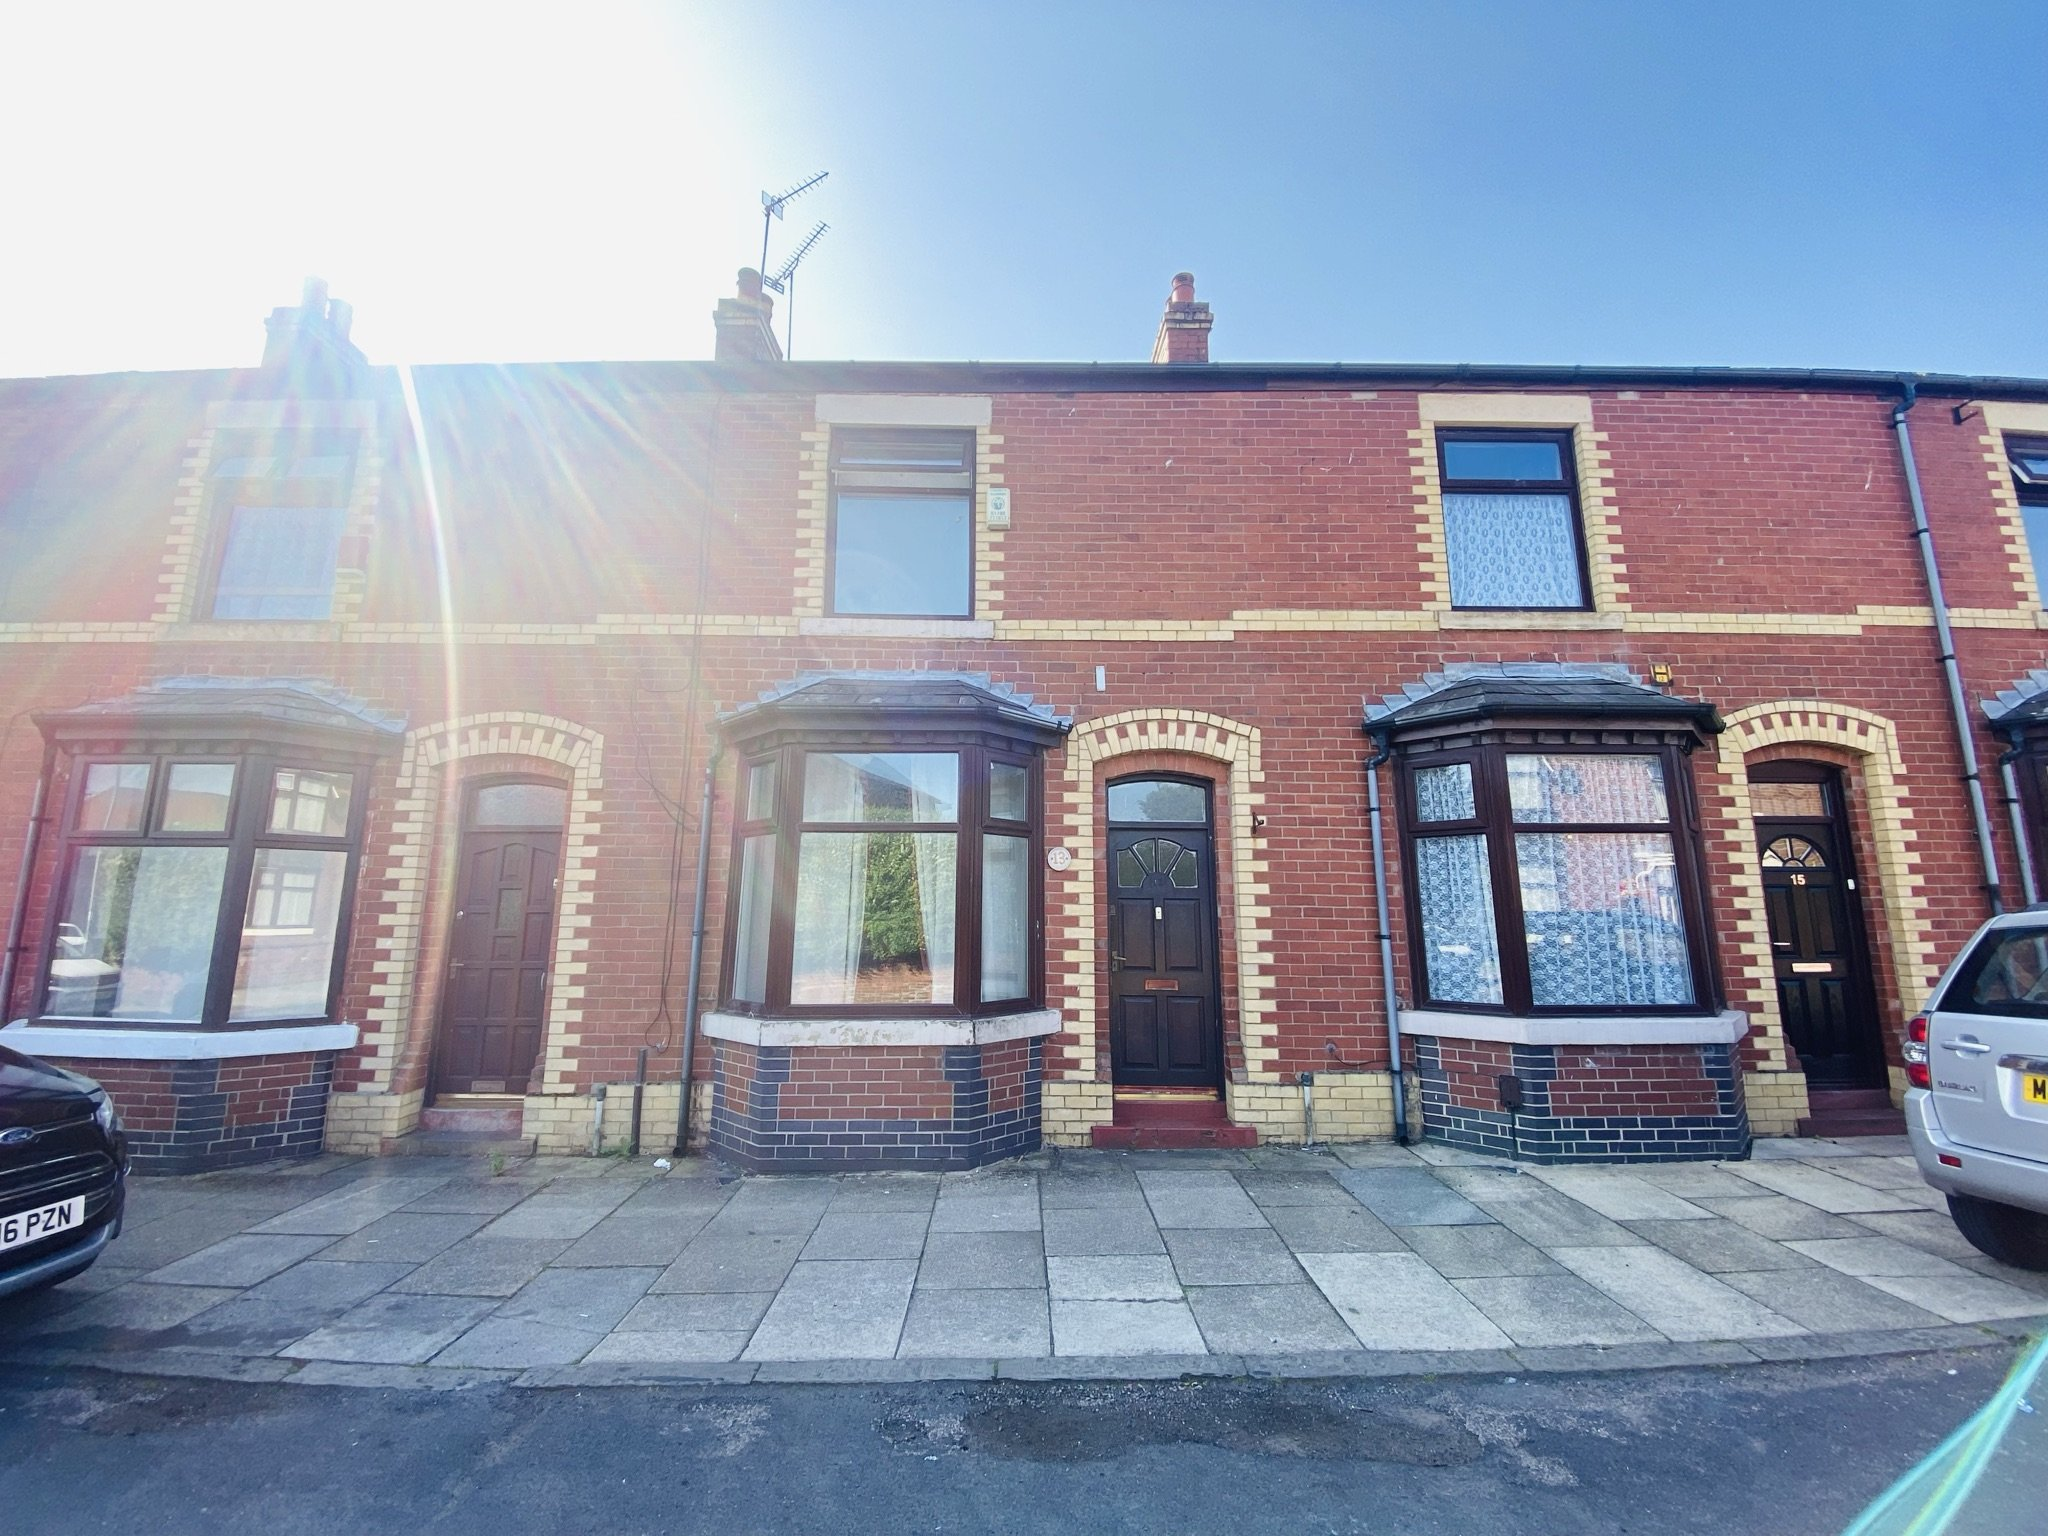 Harry Street, Castleton OL11 3HS